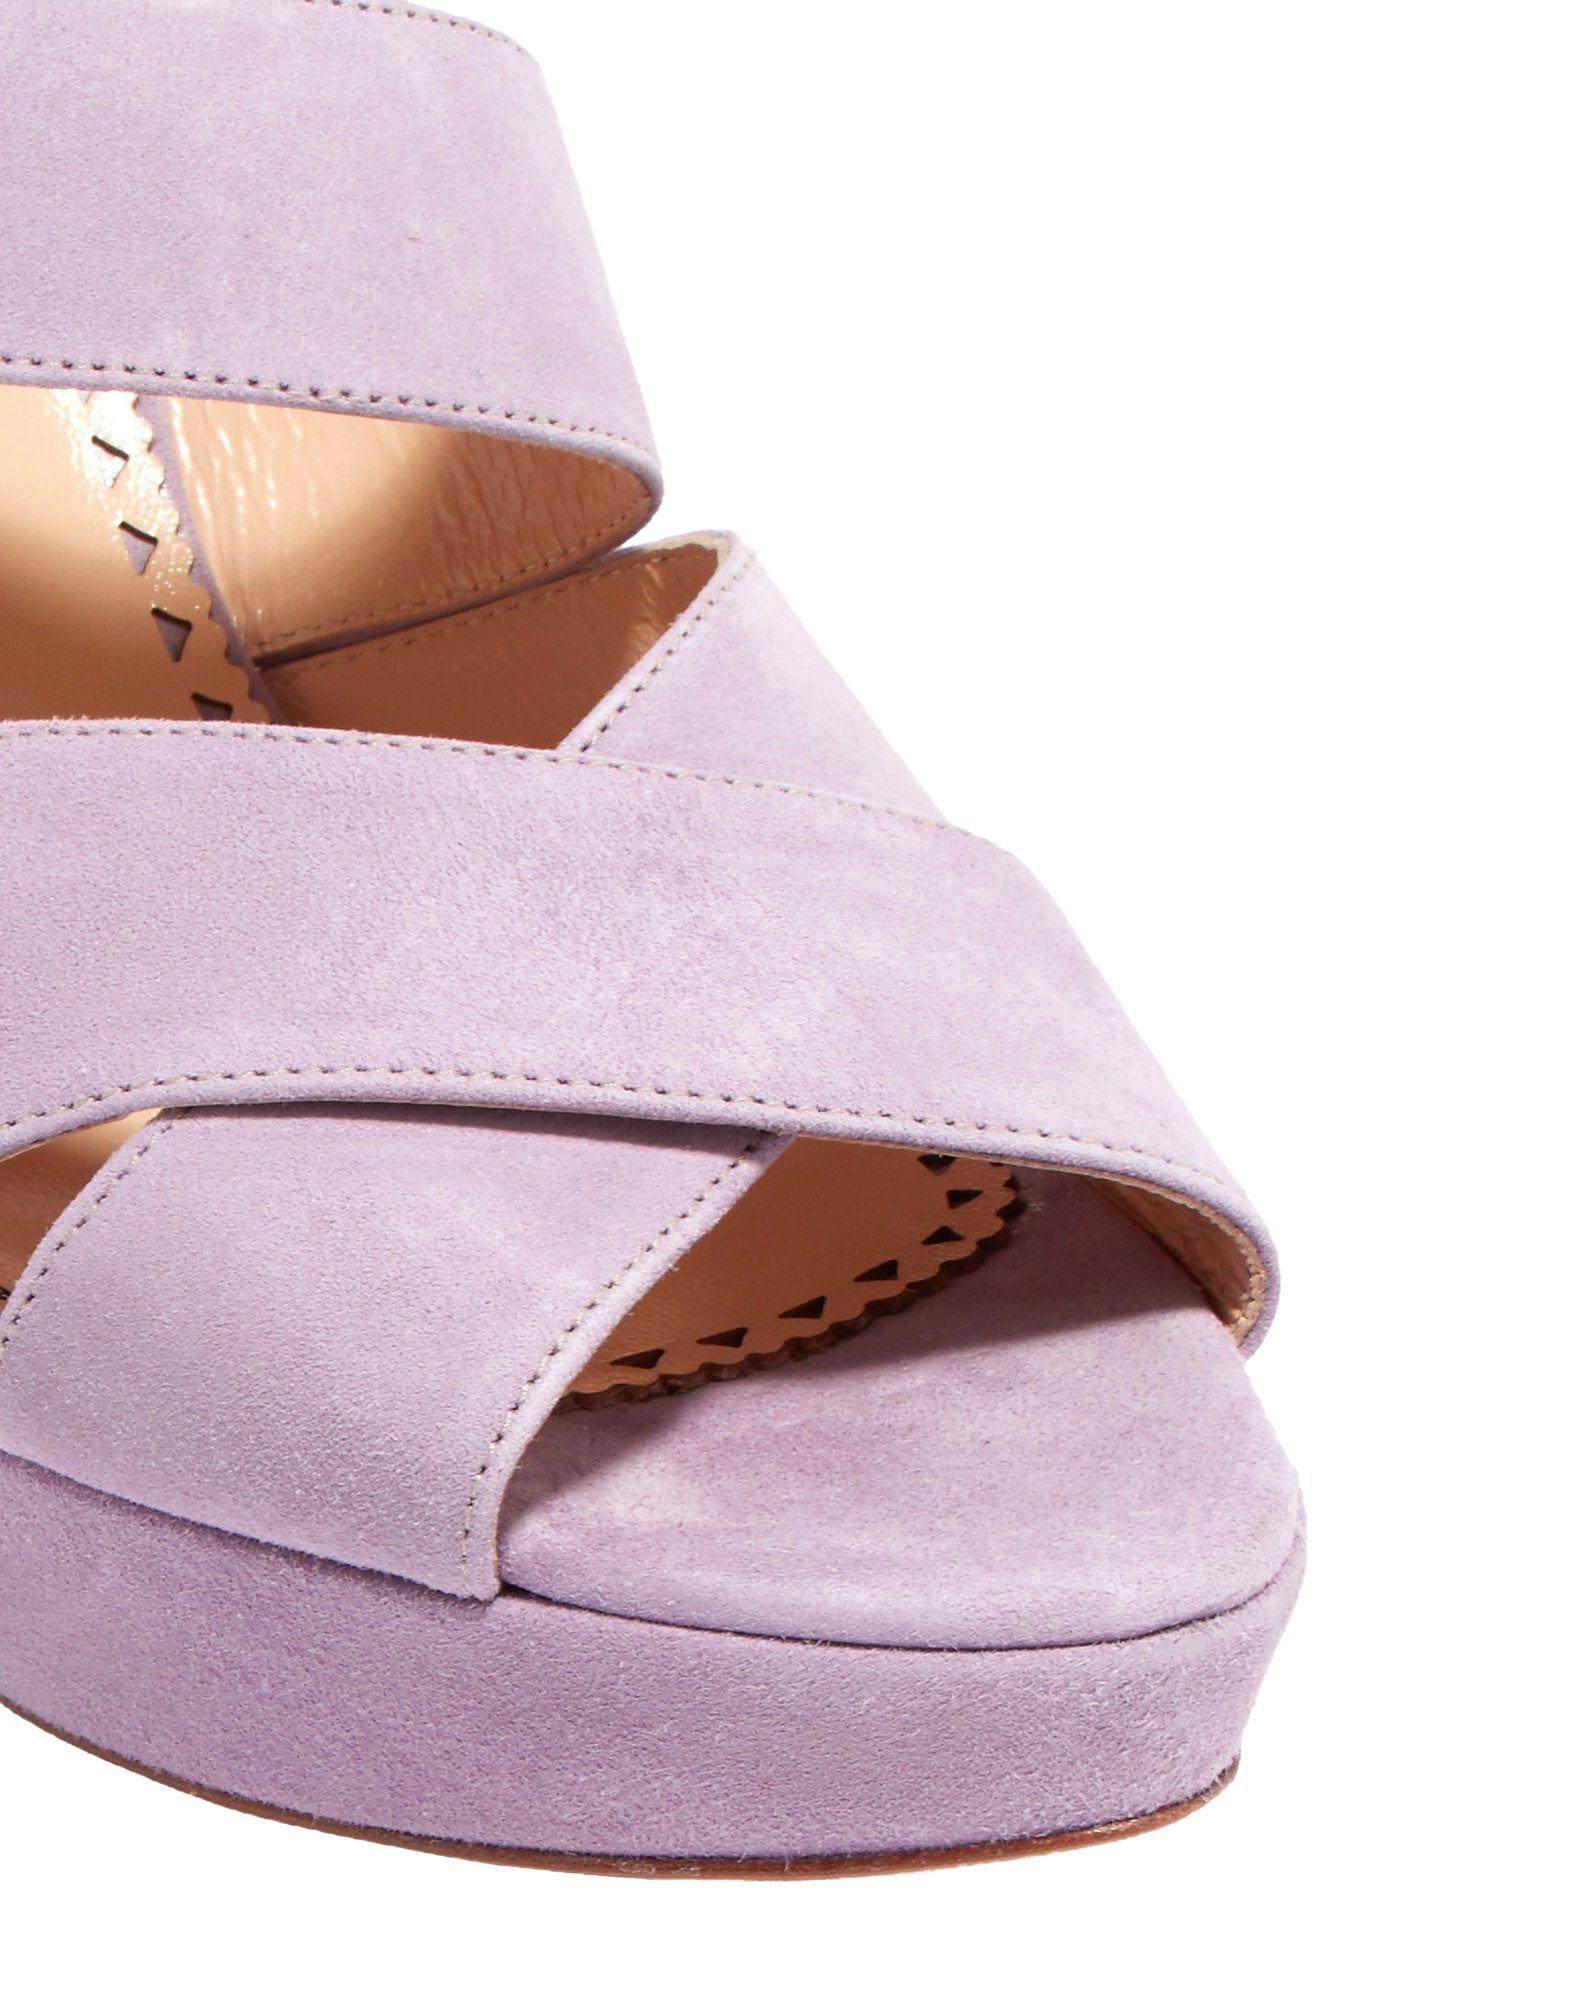 Moschino Damen Cheap And Chic Sandalen Damen Moschino  11514954KNGut aussehende strapazierfähige Schuhe 7df117